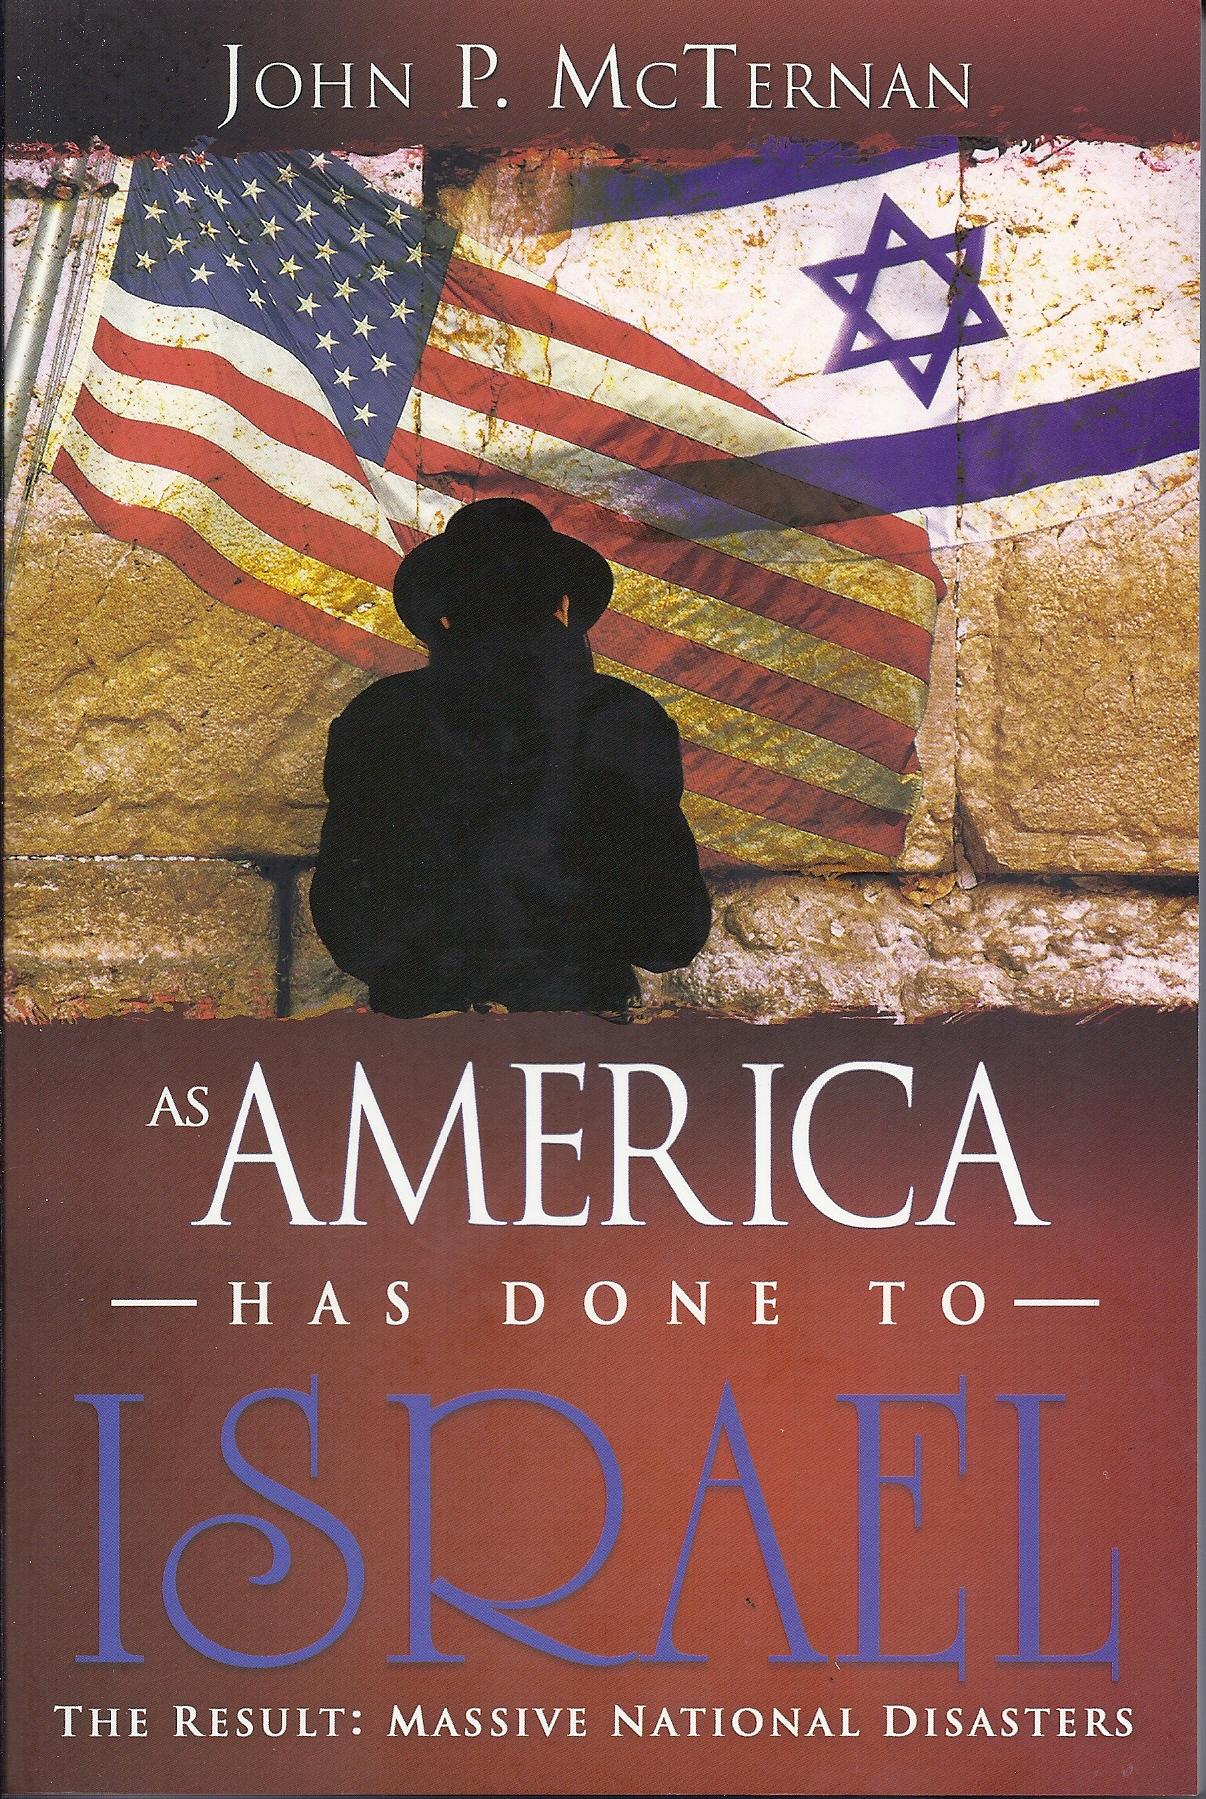 As America Has Done to Israel, by John McTernan